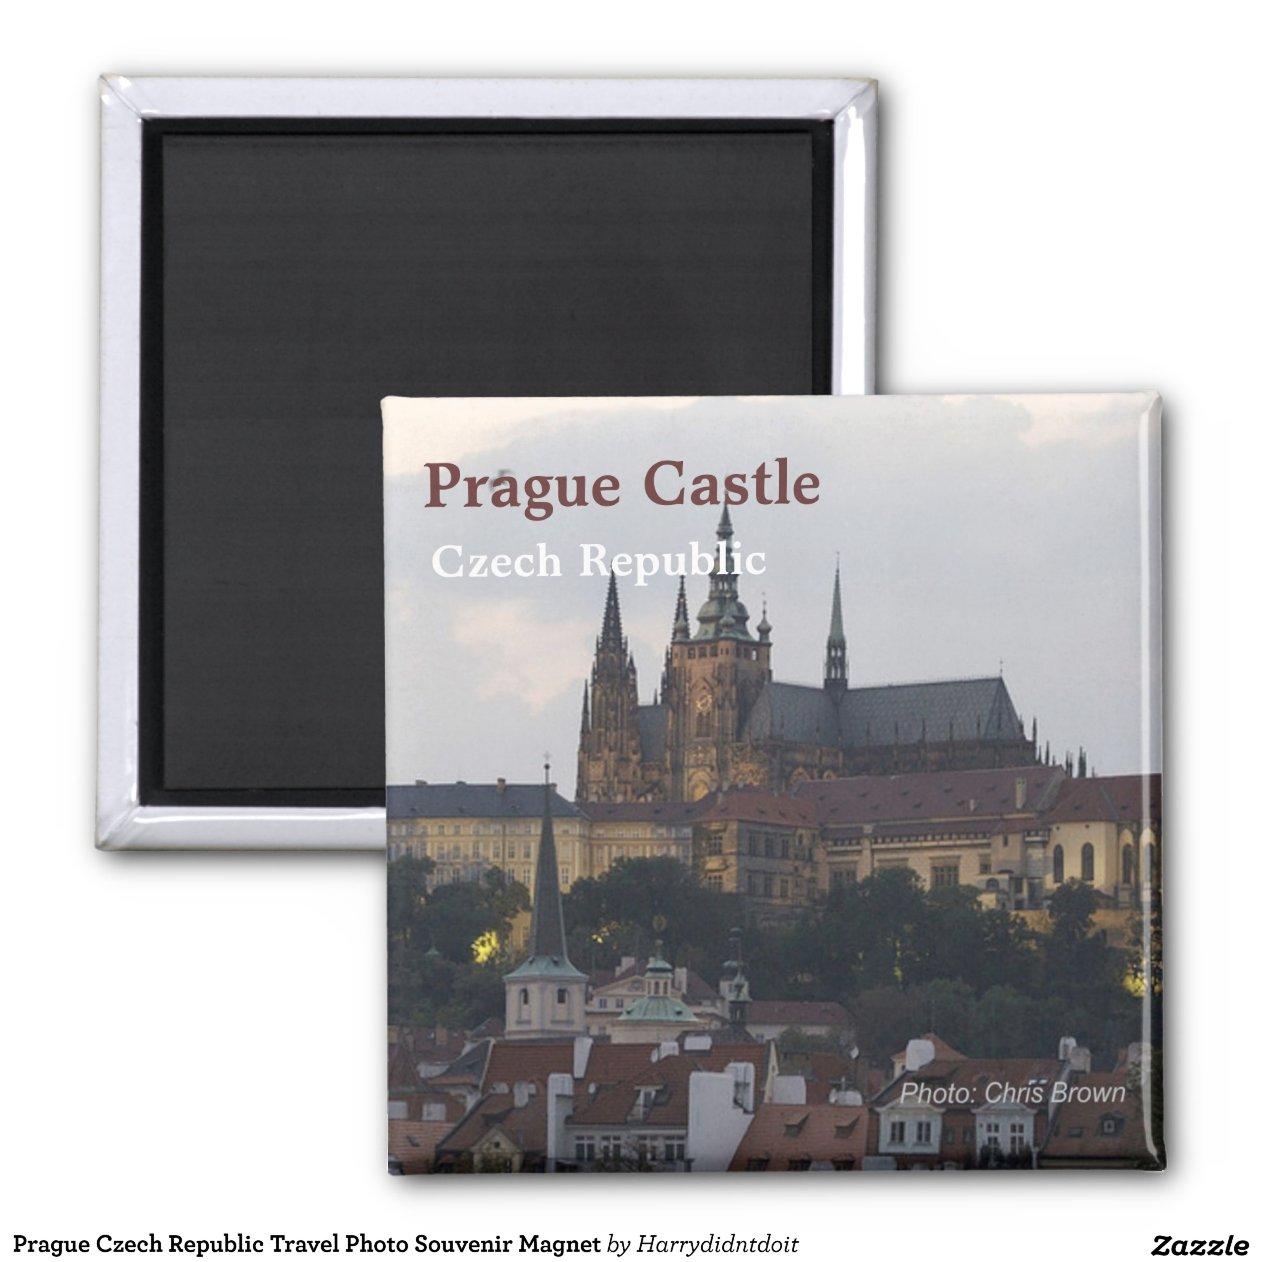 tschechische republik reise foto andenken magnet. Black Bedroom Furniture Sets. Home Design Ideas